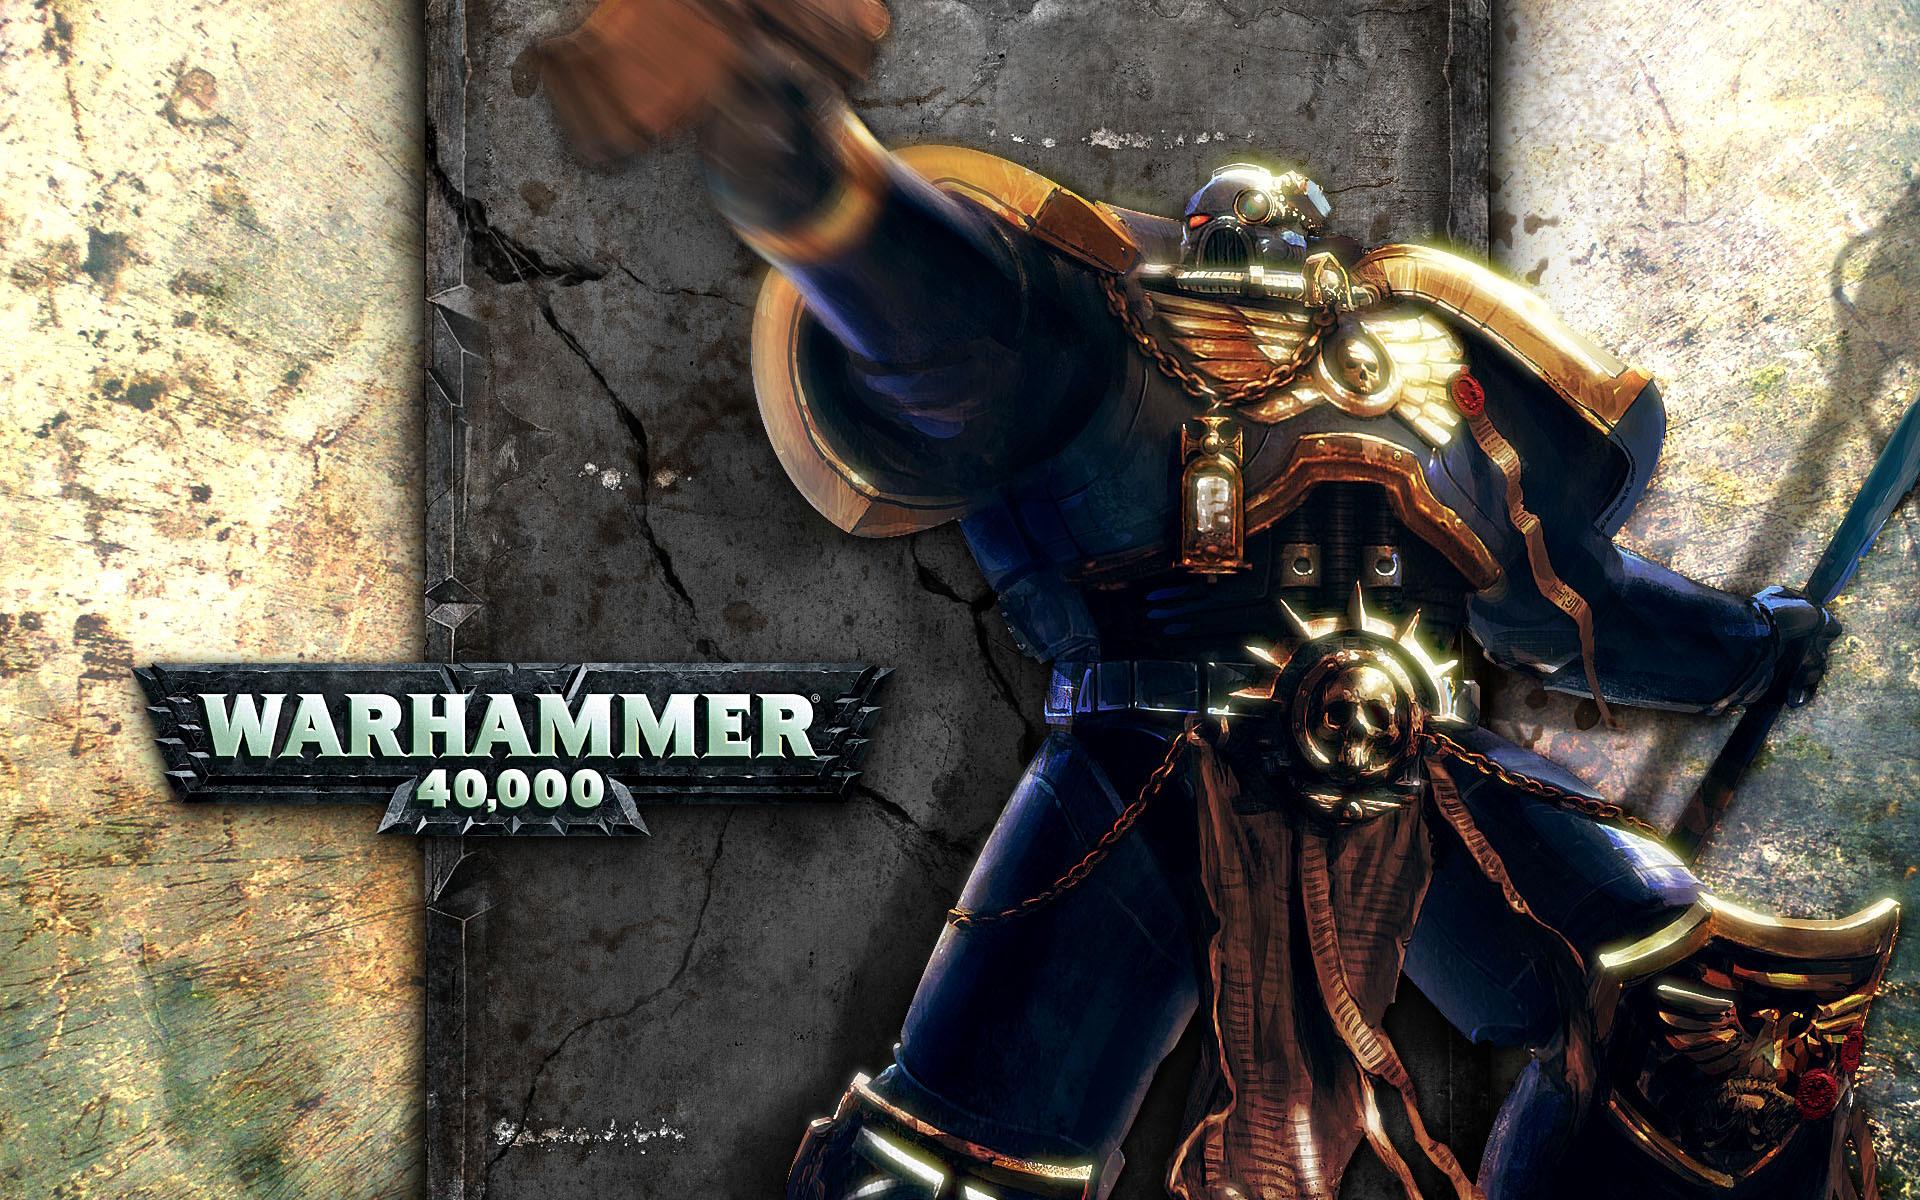 Warhammer 40k Ultramarines Space Marine wallpaper 1920x1200 112977 1920x1200